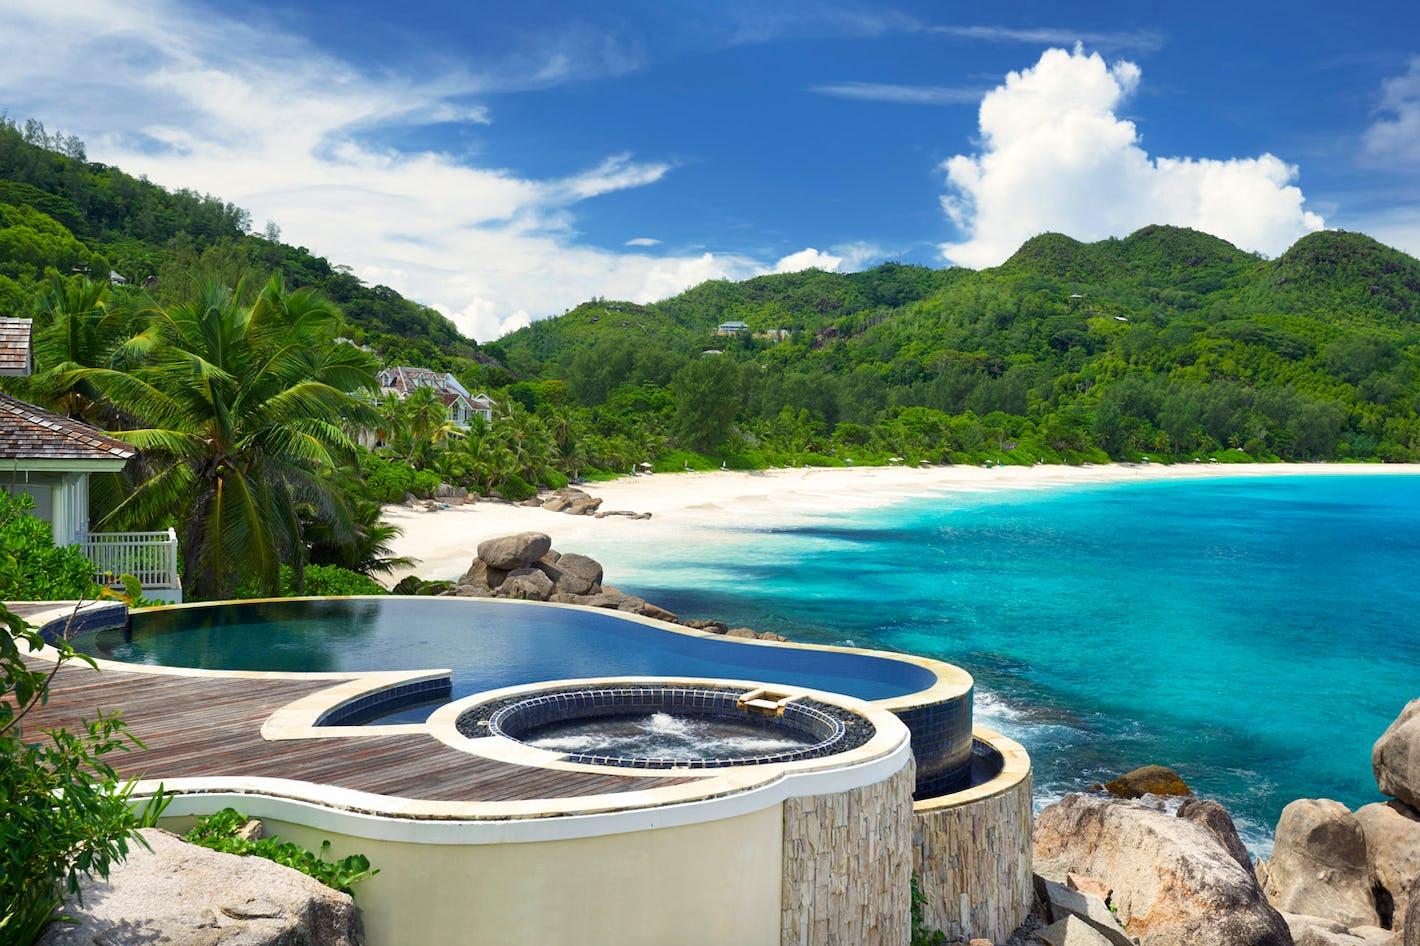 Banyan Tree Resort Seychelles Islands